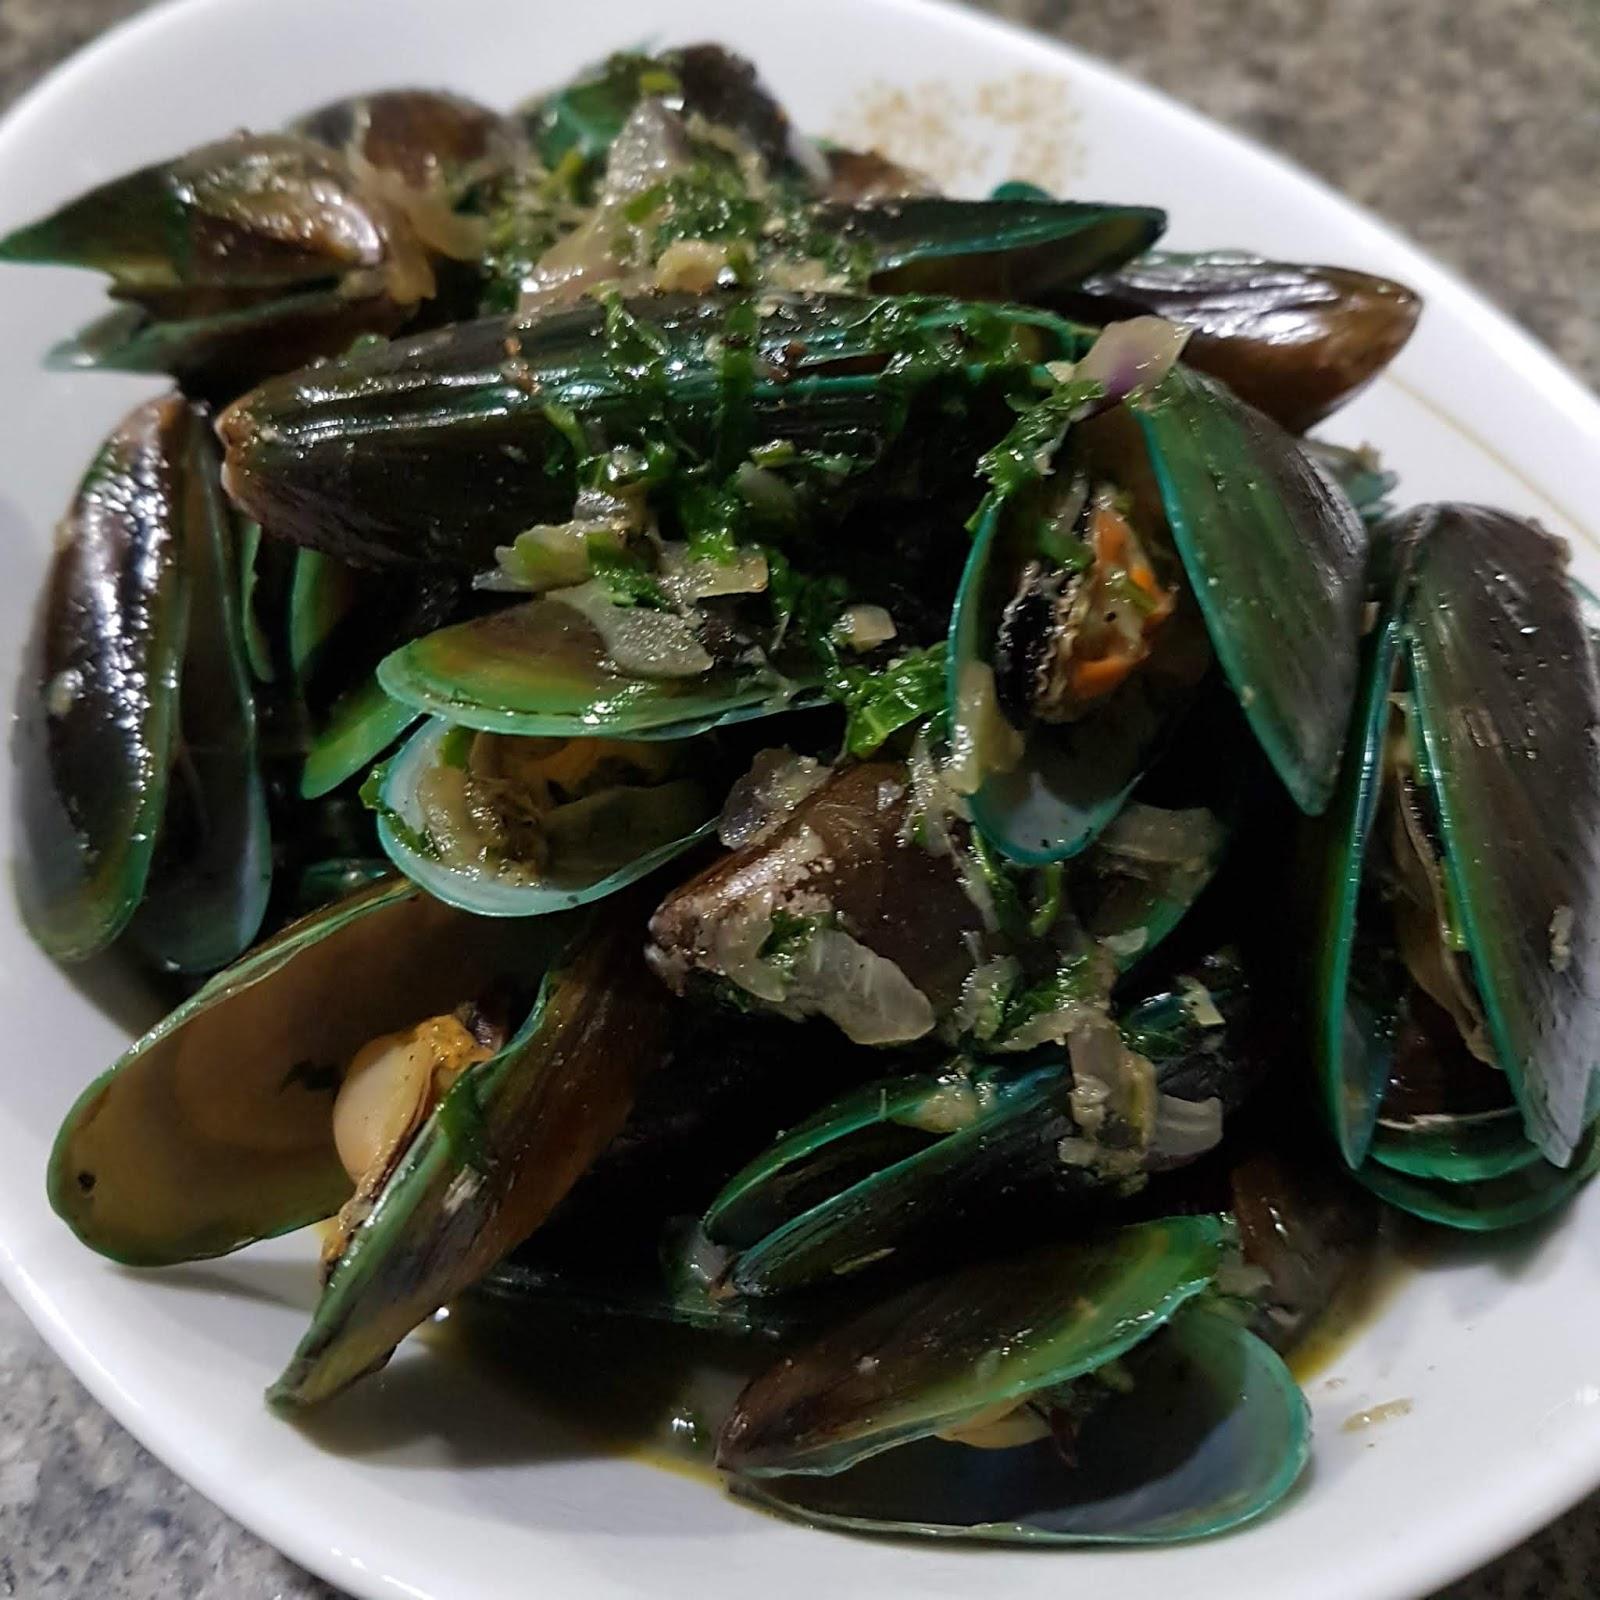 Recipe Tahong Na May Bawang Luya At Dahon Ng Sili Mussels Cooked With Garlic Ginger And Chili Pepper Leaves It S All About Food